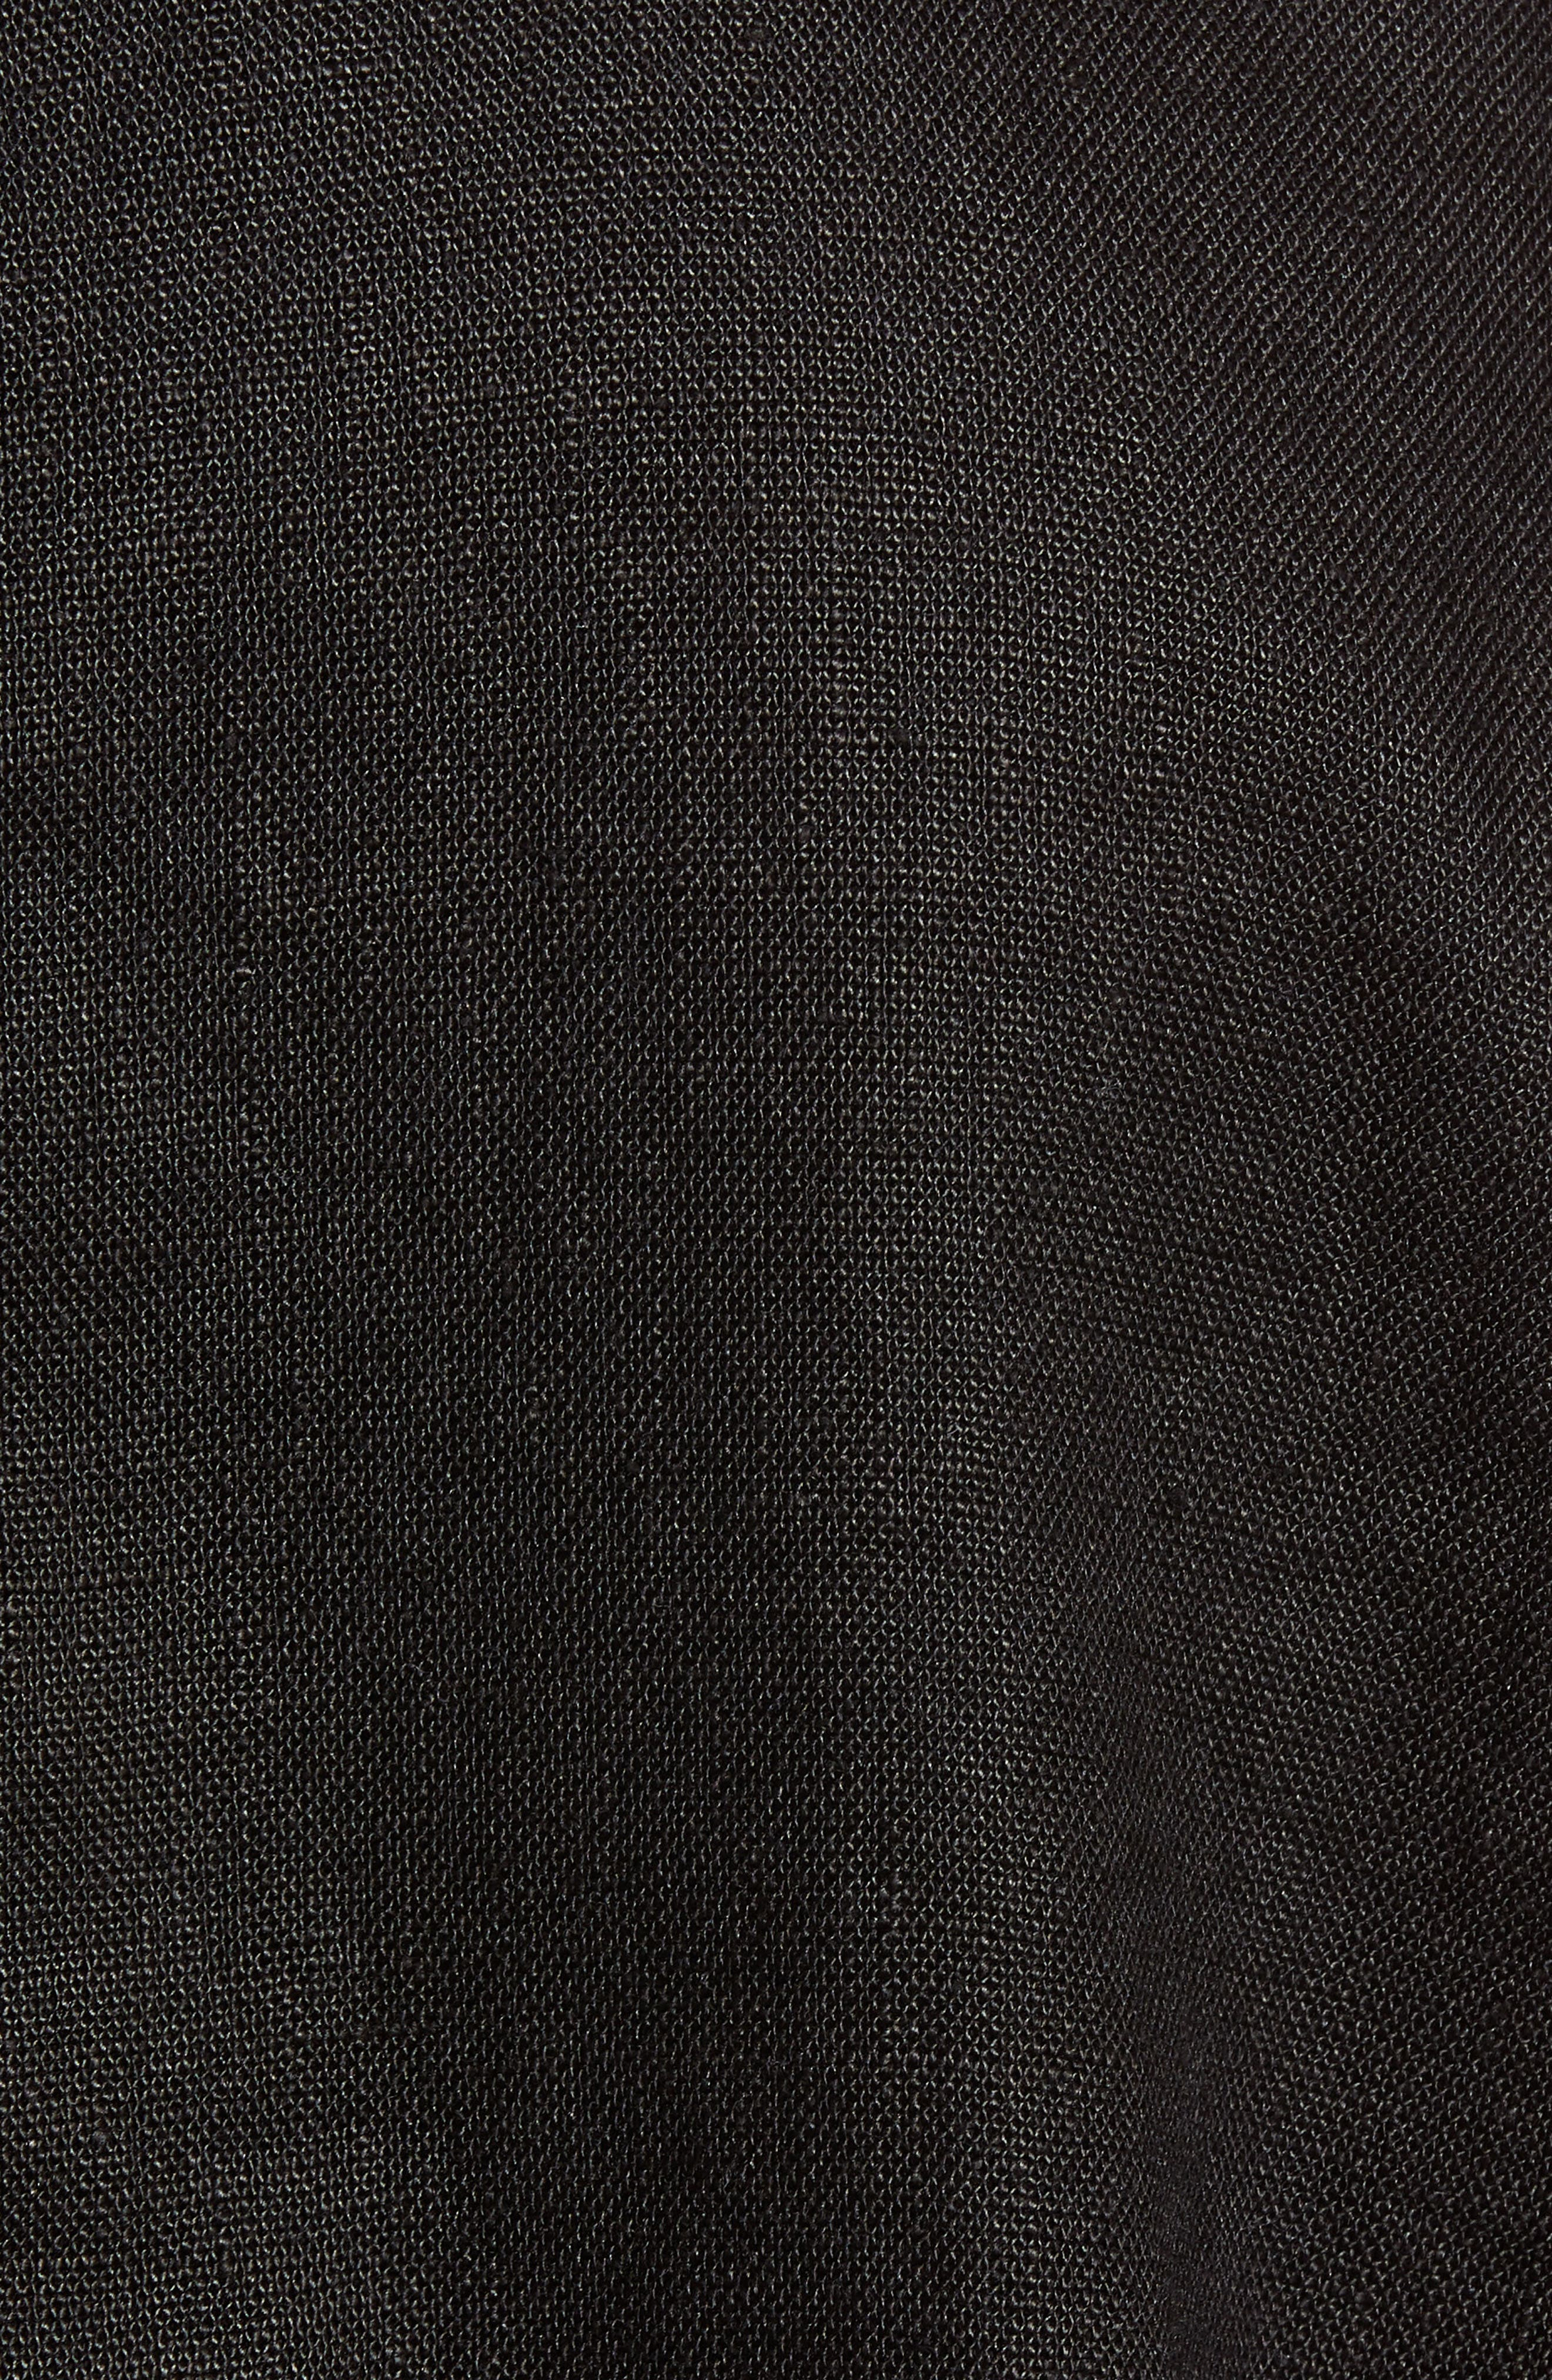 Drawstring Organic Linen Jacket,                             Alternate thumbnail 6, color,                             Black